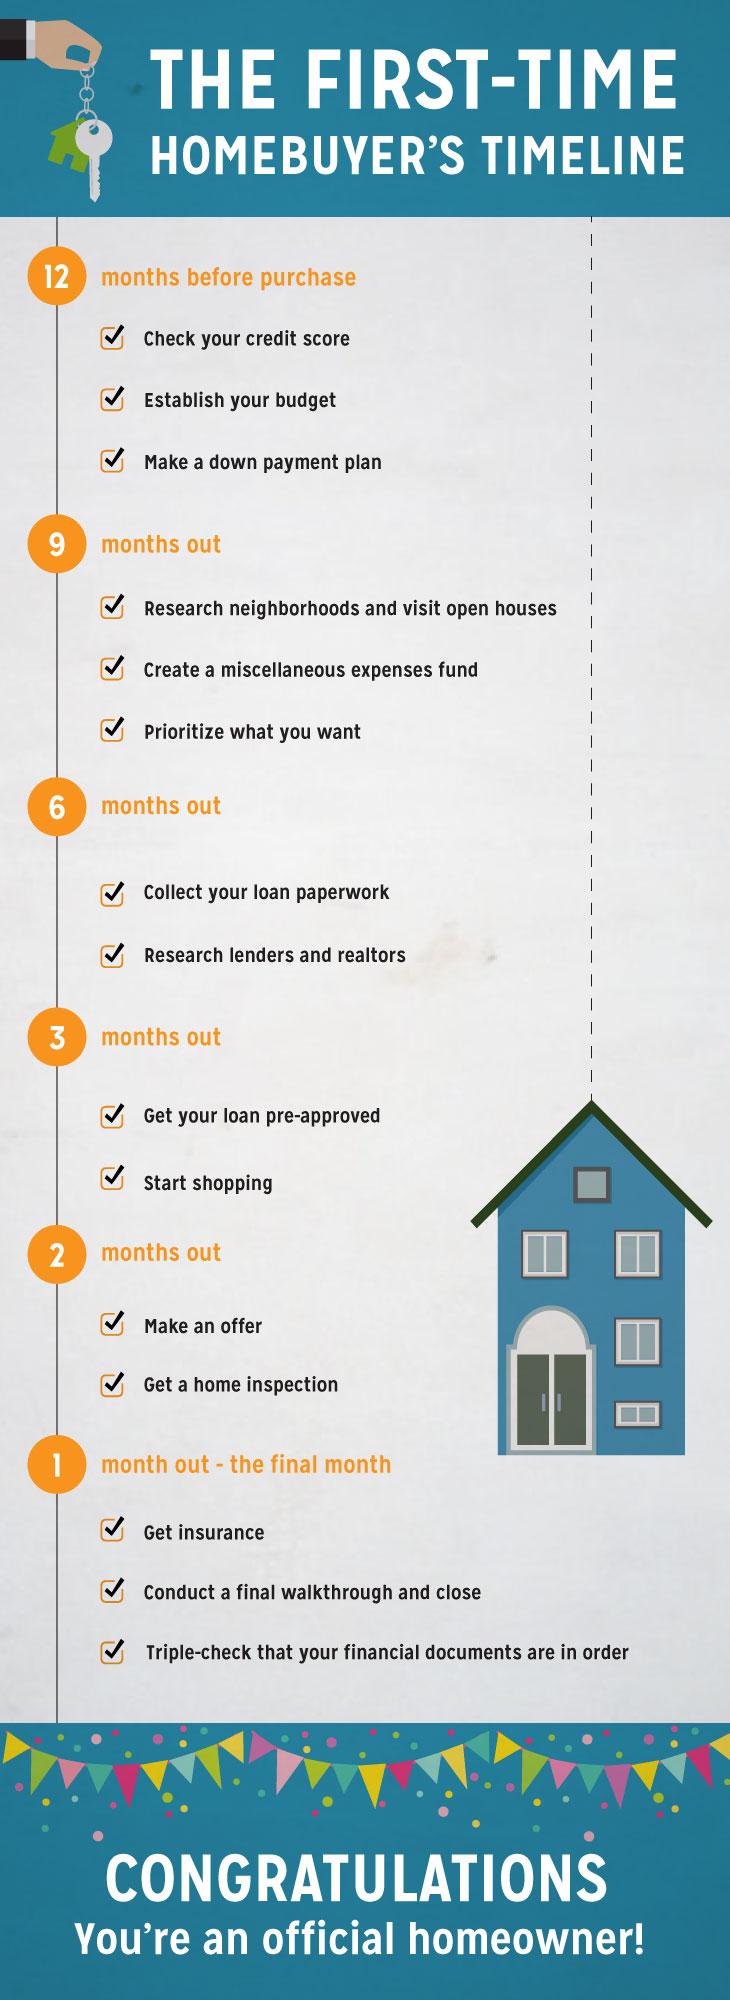 First-time homebuyer timeline